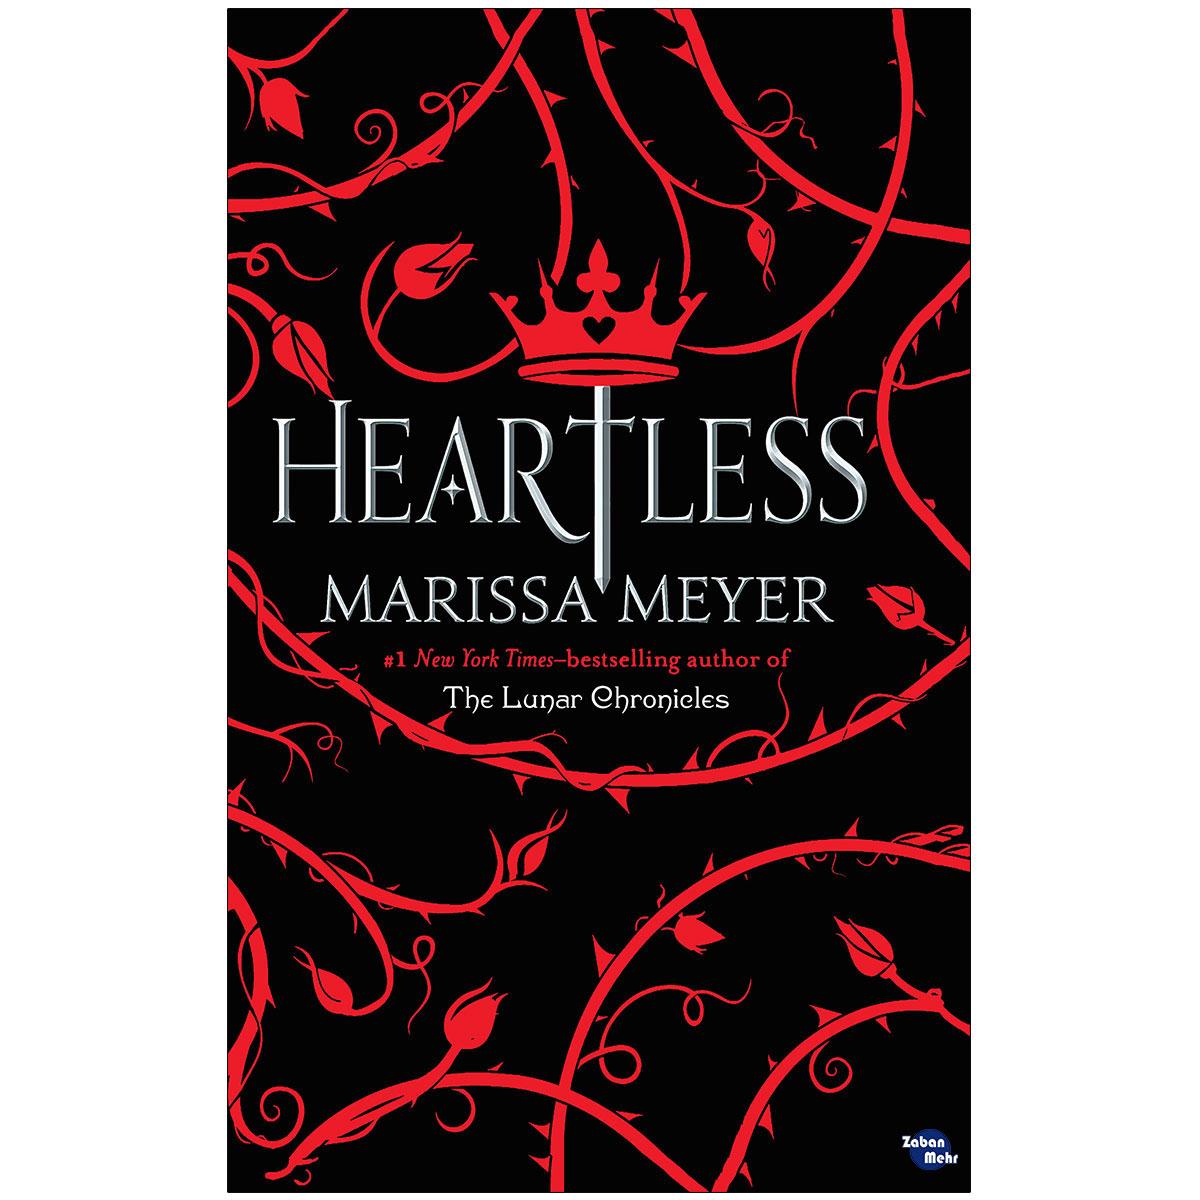 کتاب HEARTLESS اثر Marissa Meyer انتشارات زبان مهر